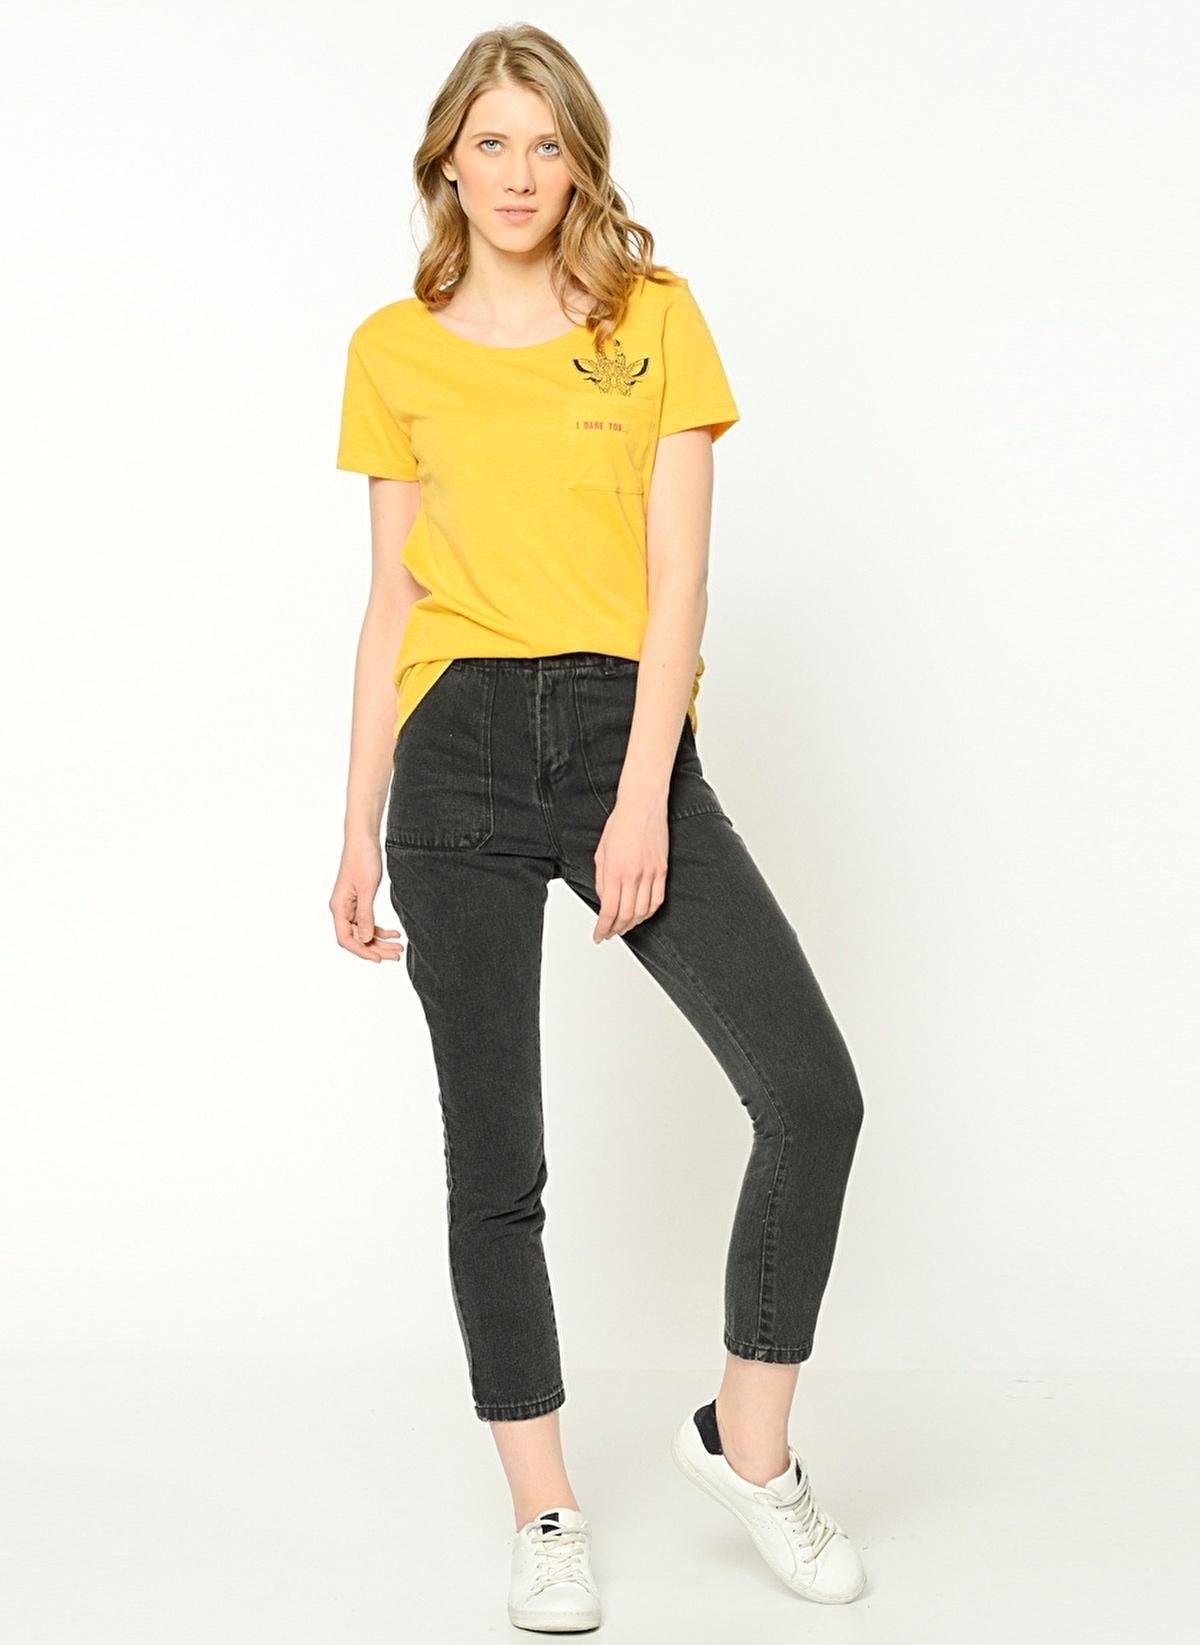 Vero Moda Jean Pantolon | Ankle Boyfriend 79.9 Tl